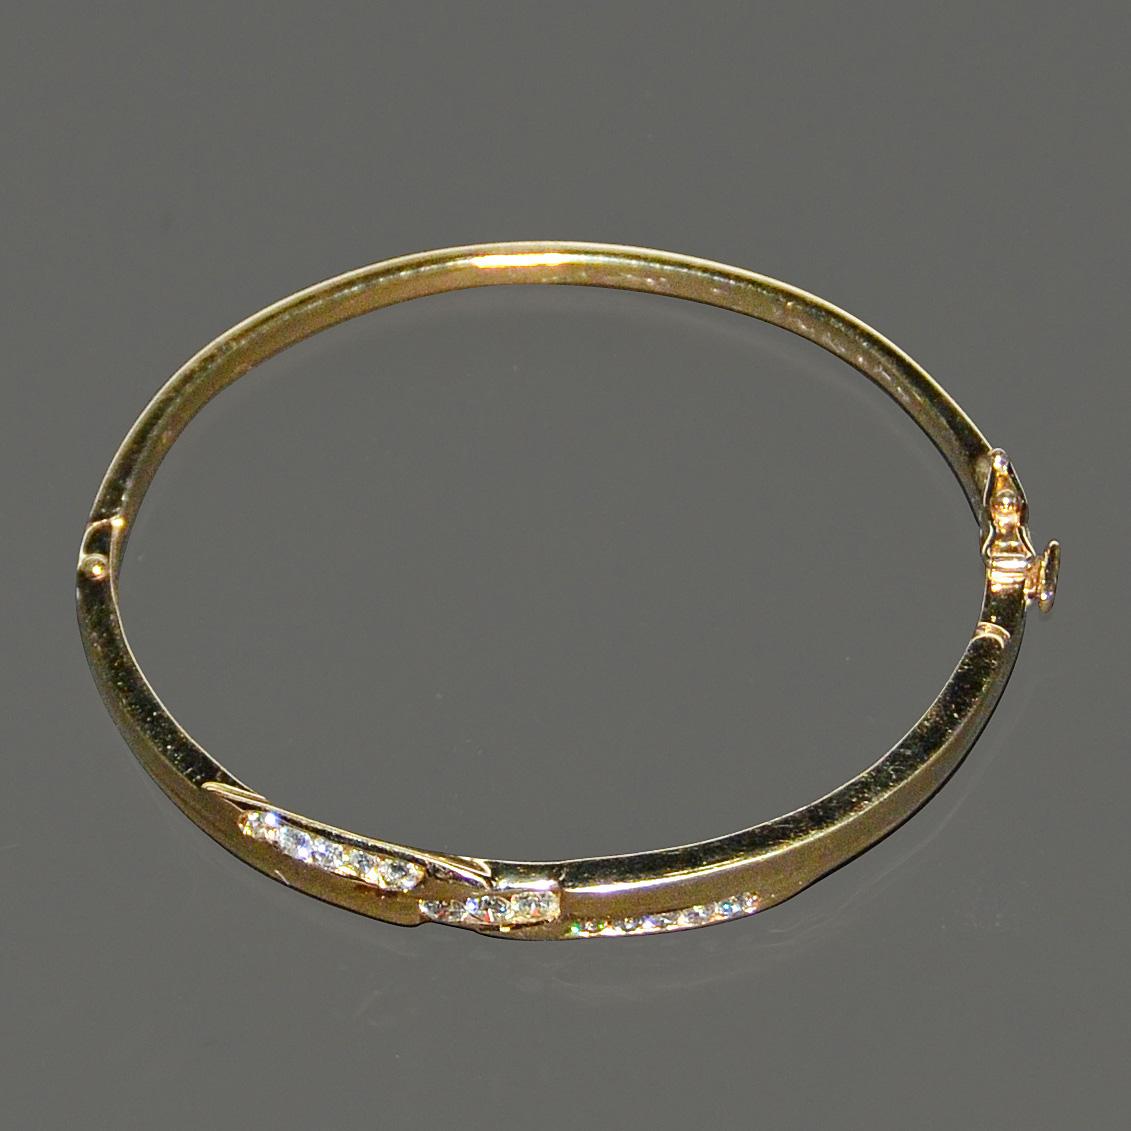 Lot 14 - 2.65 克拉鑽石手鐲鑲18K黃金 附美國寶石學院 AIG 鑒定證書 18K Yellow Gold and Diamond Bracelet Three channel set round